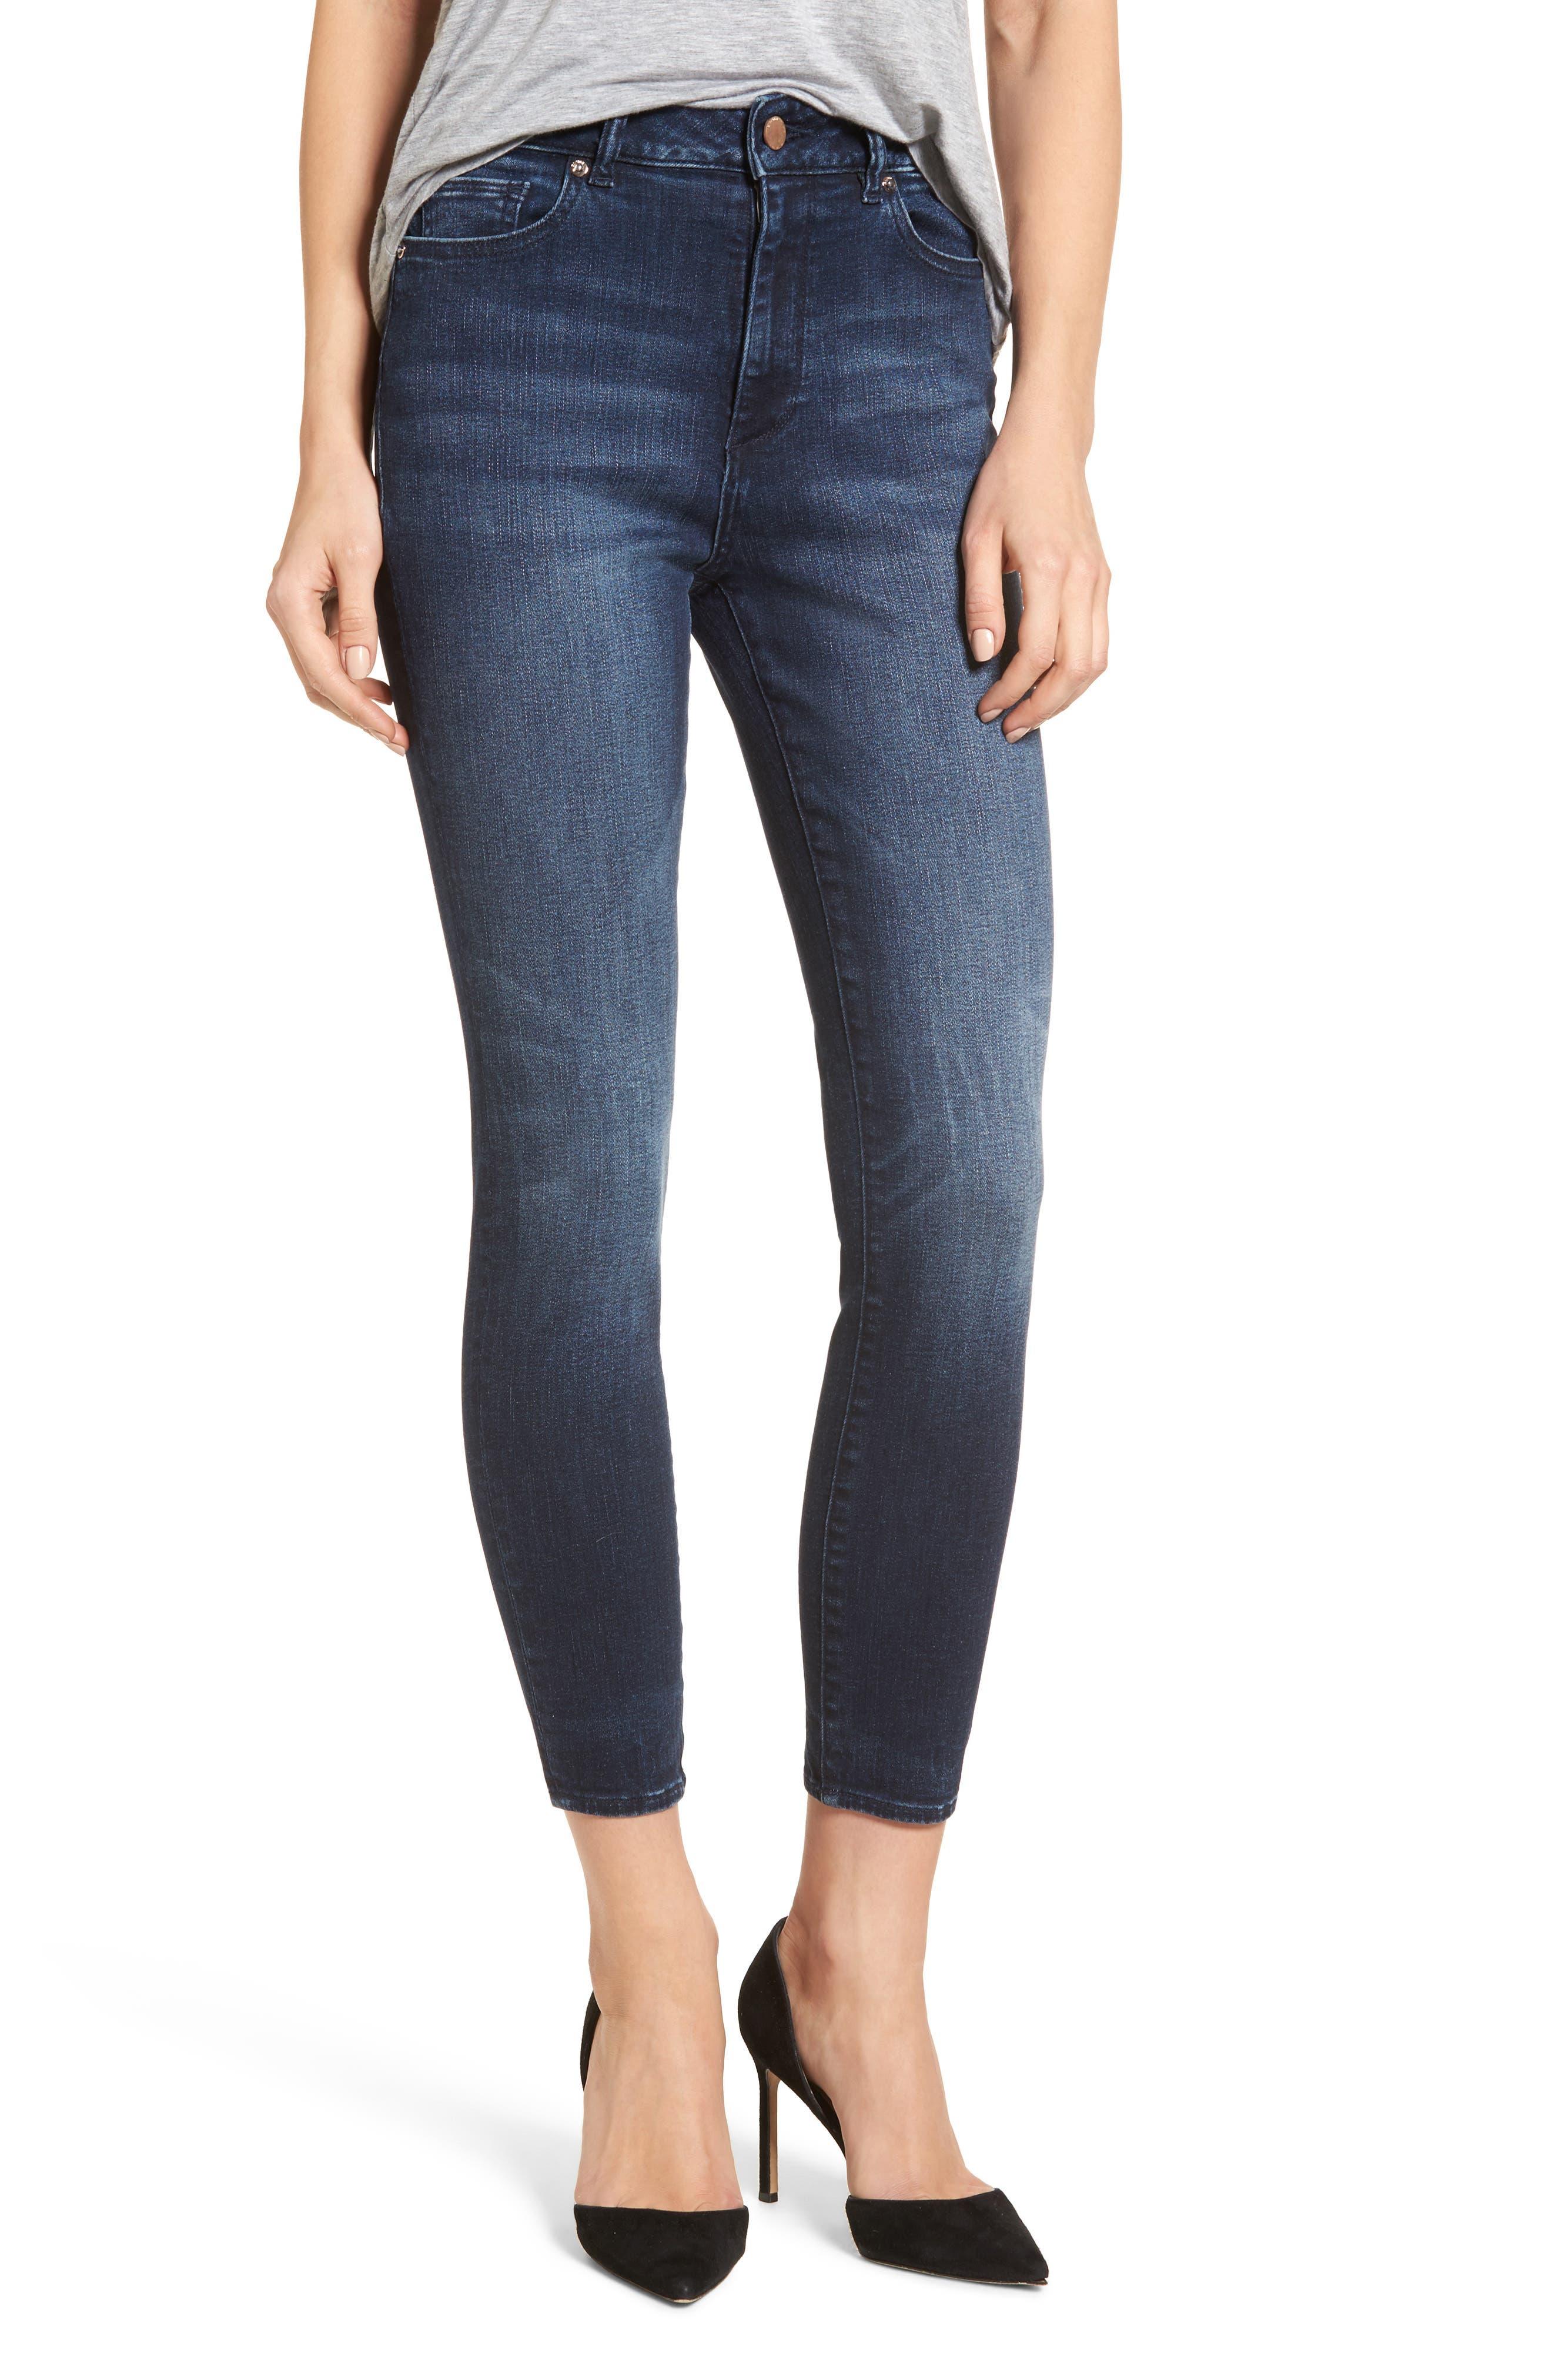 Carlie High Waist Ankle Skinny Jeans,                             Main thumbnail 1, color,                             Spritz